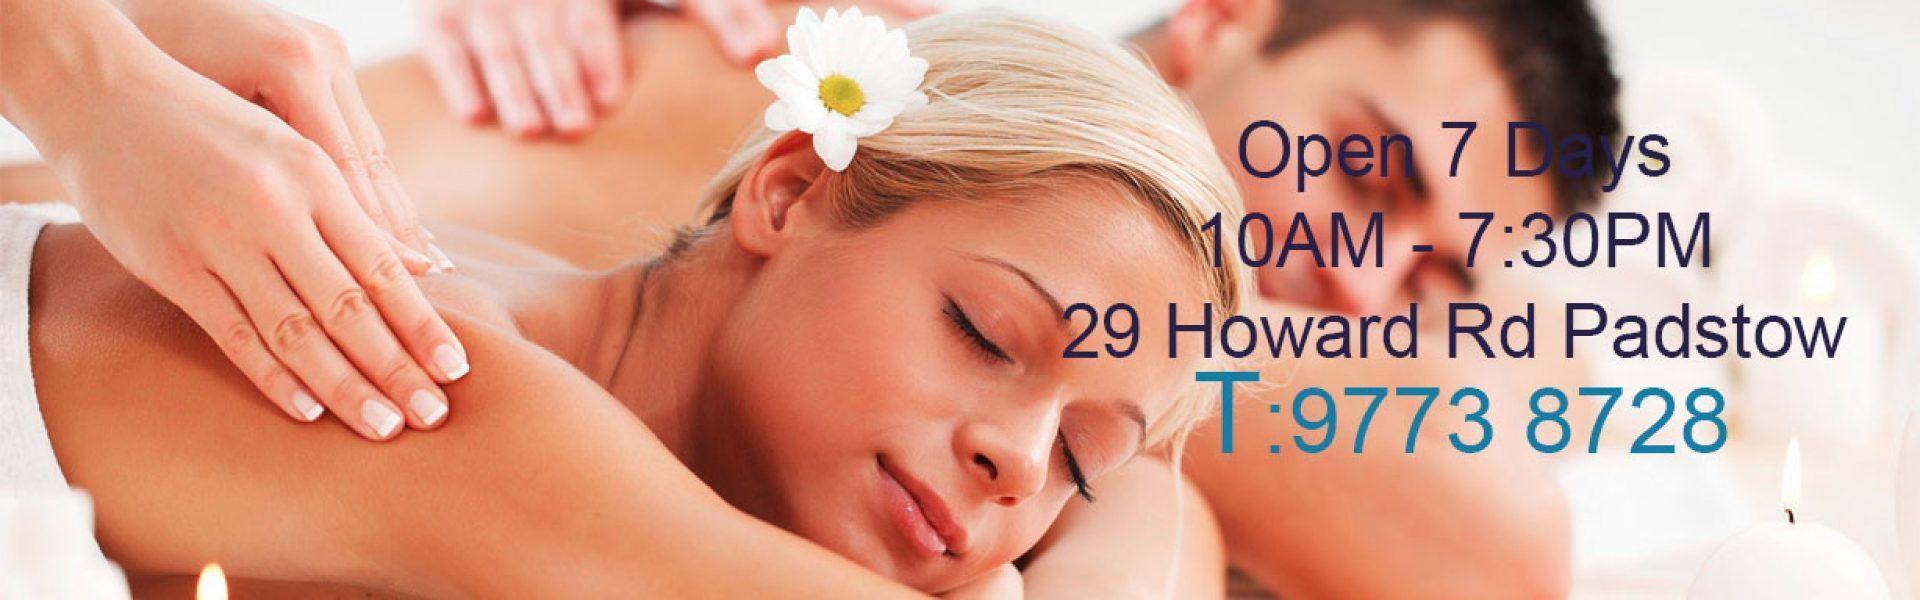 Padstow Massage, Professional Massage Padstow